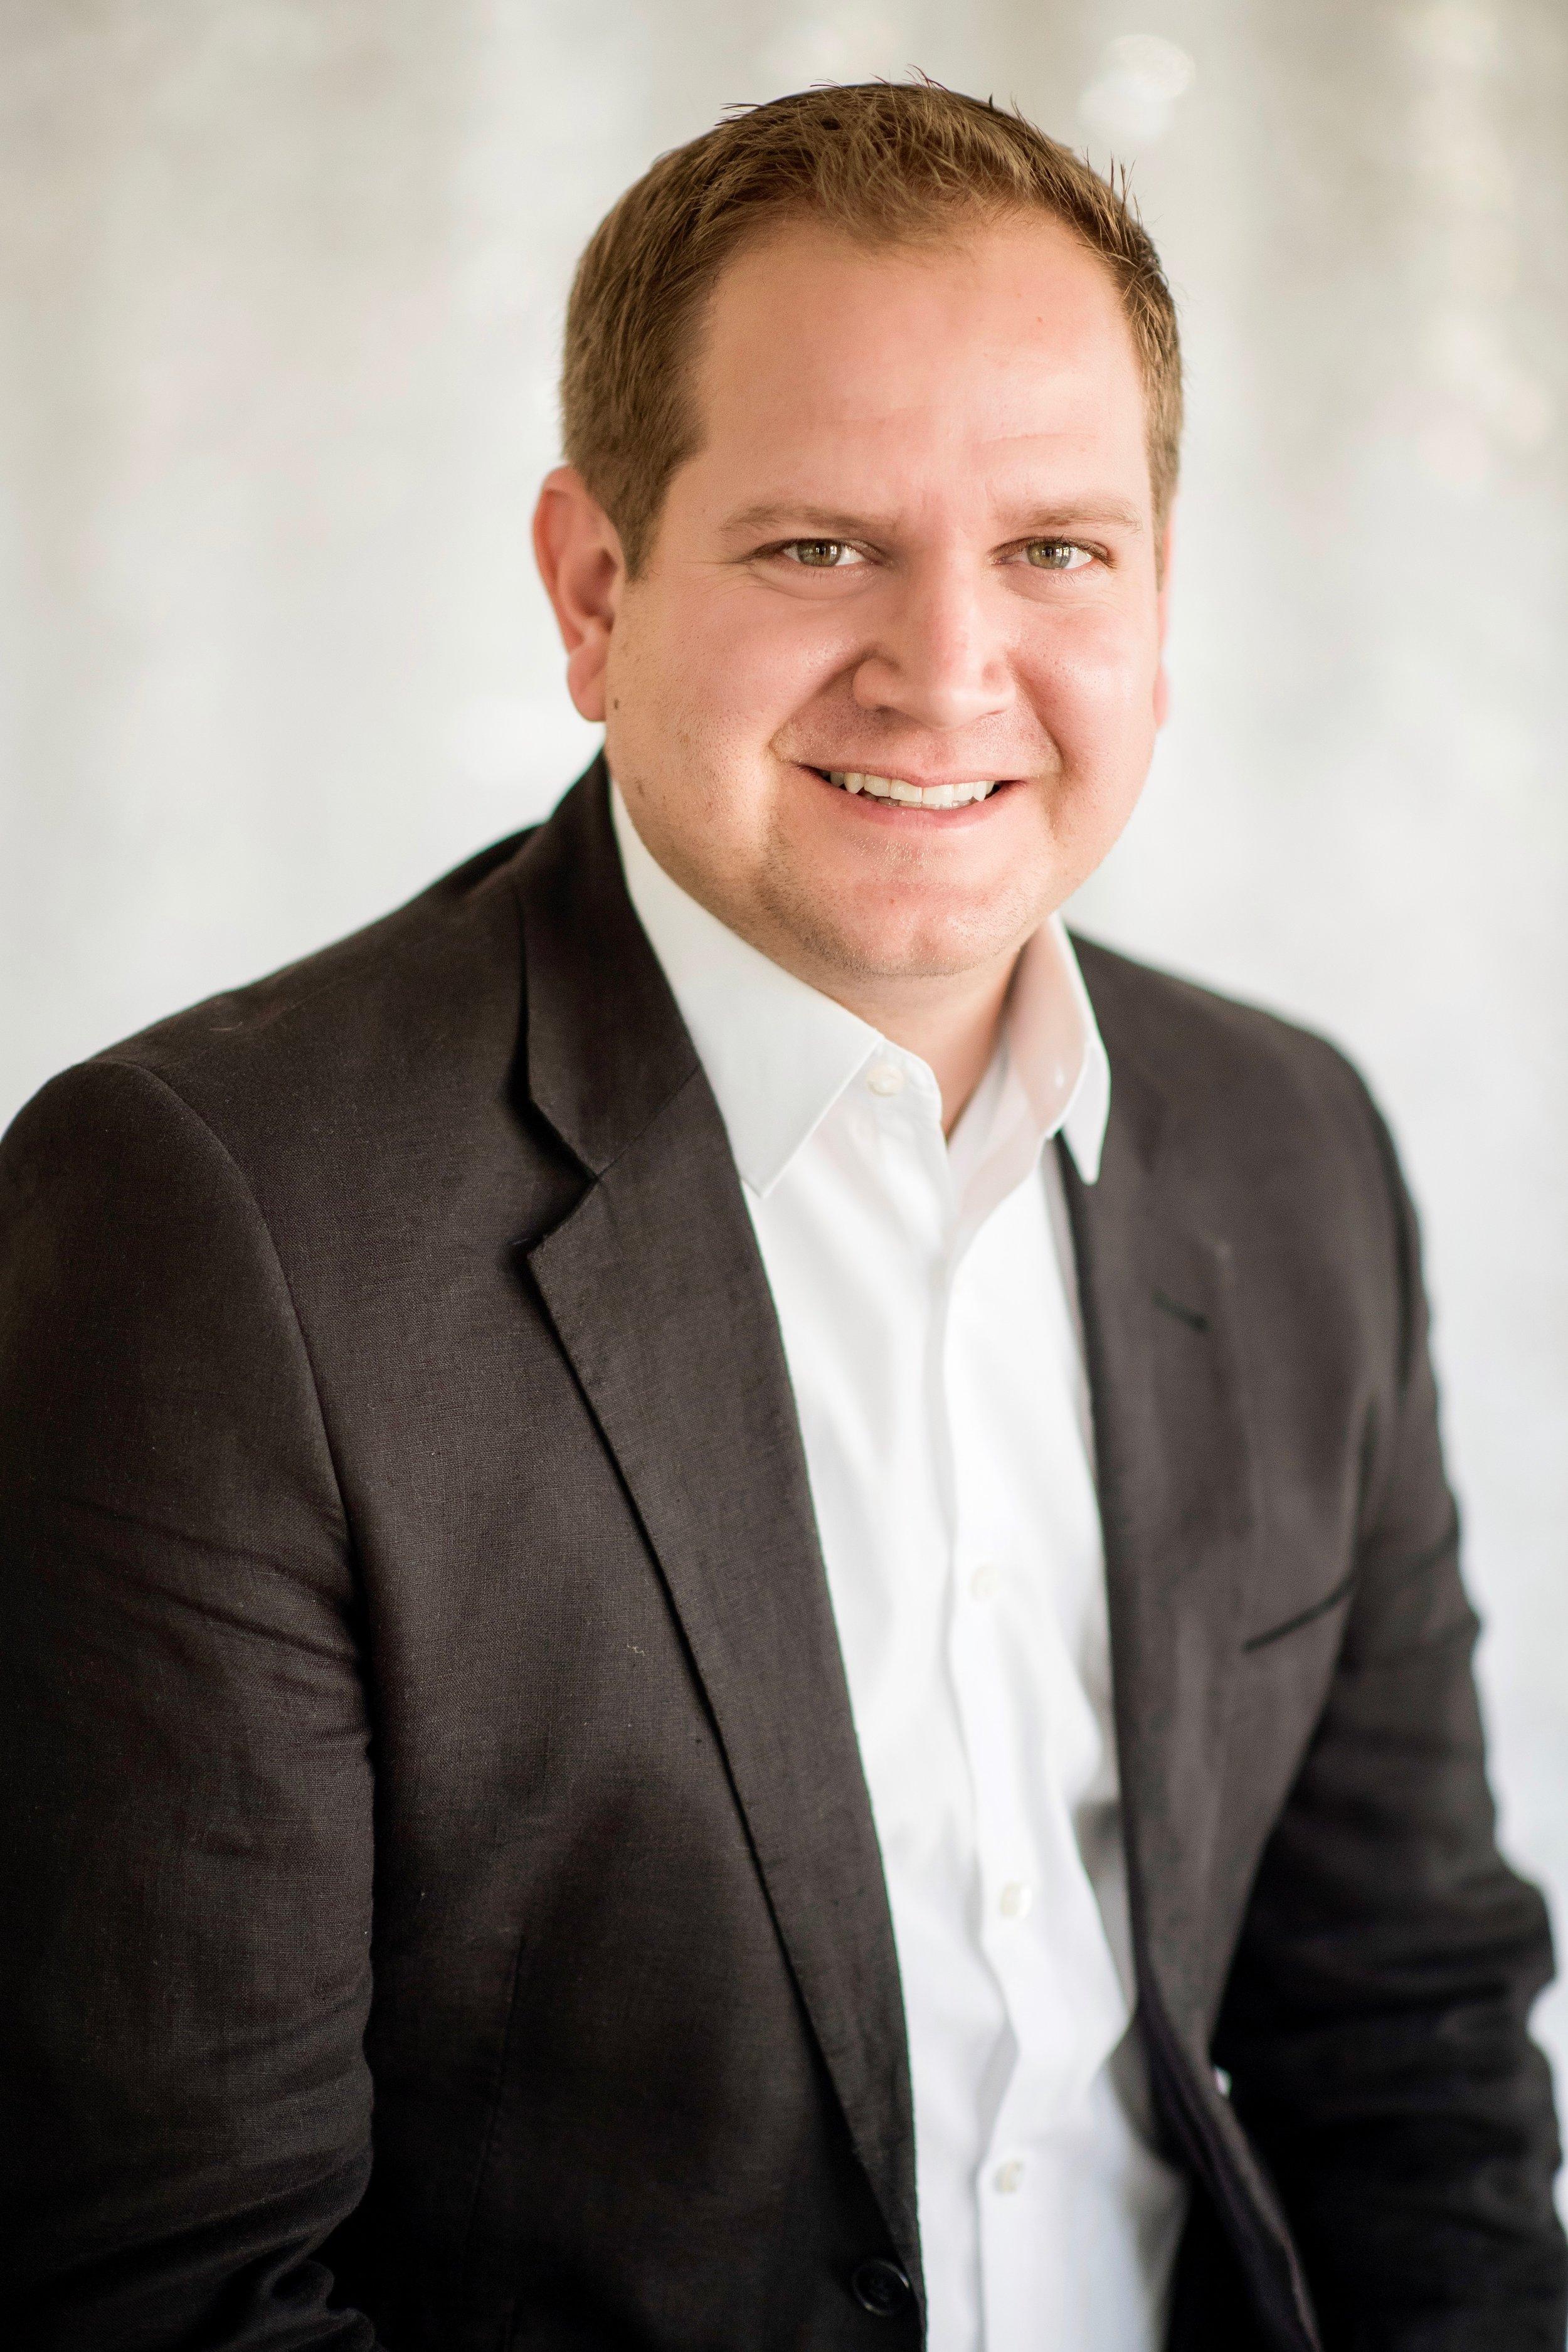 StoryBrand Expert Josh Taylor